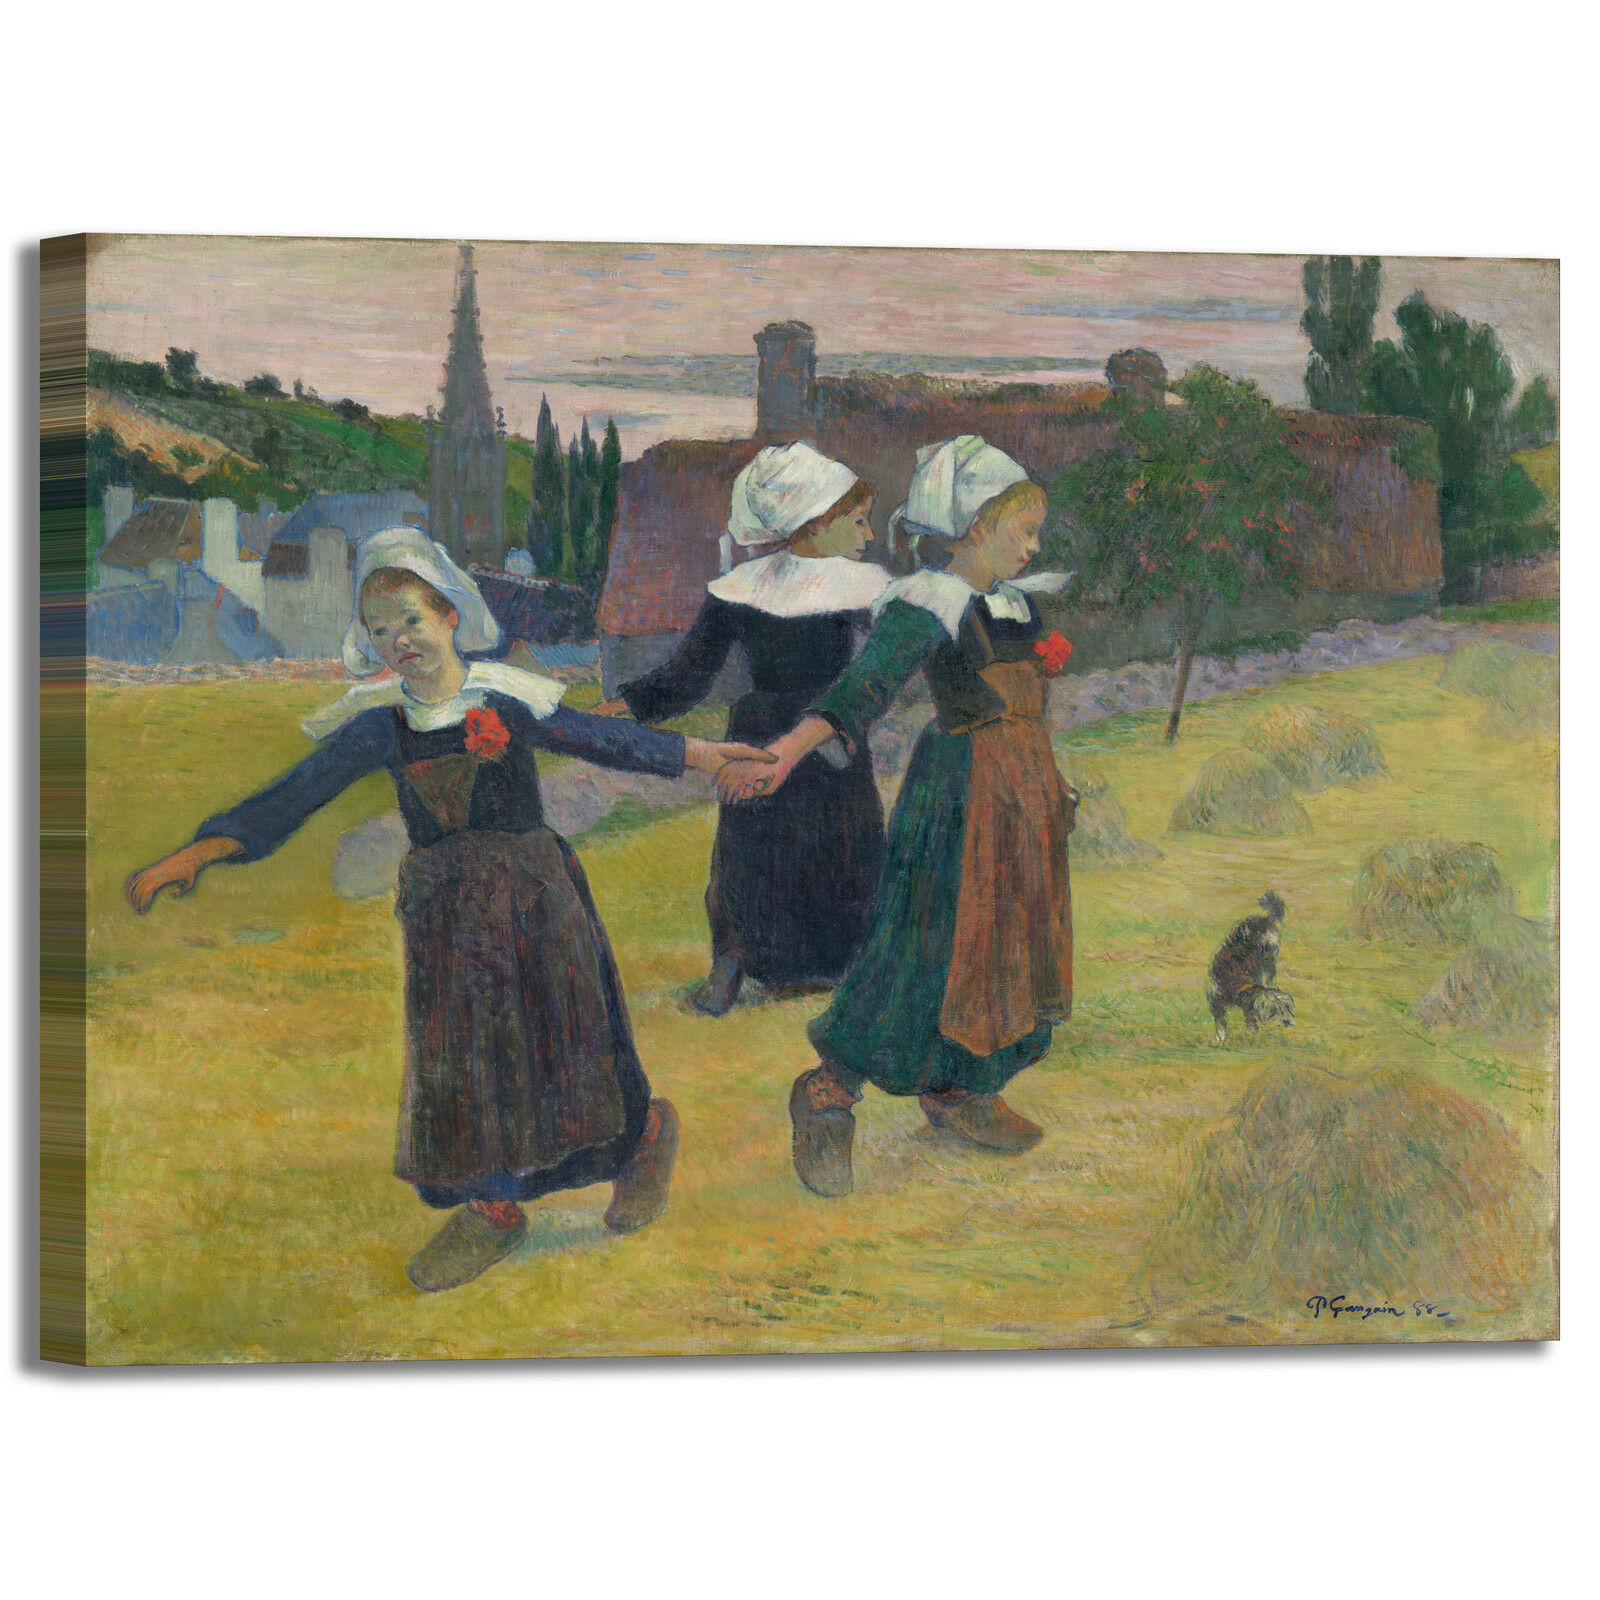 Gauguin ragazze bretoni ballano quadro o stampa tela dipinto telaio arRouge o quadro casa 0e6fcf